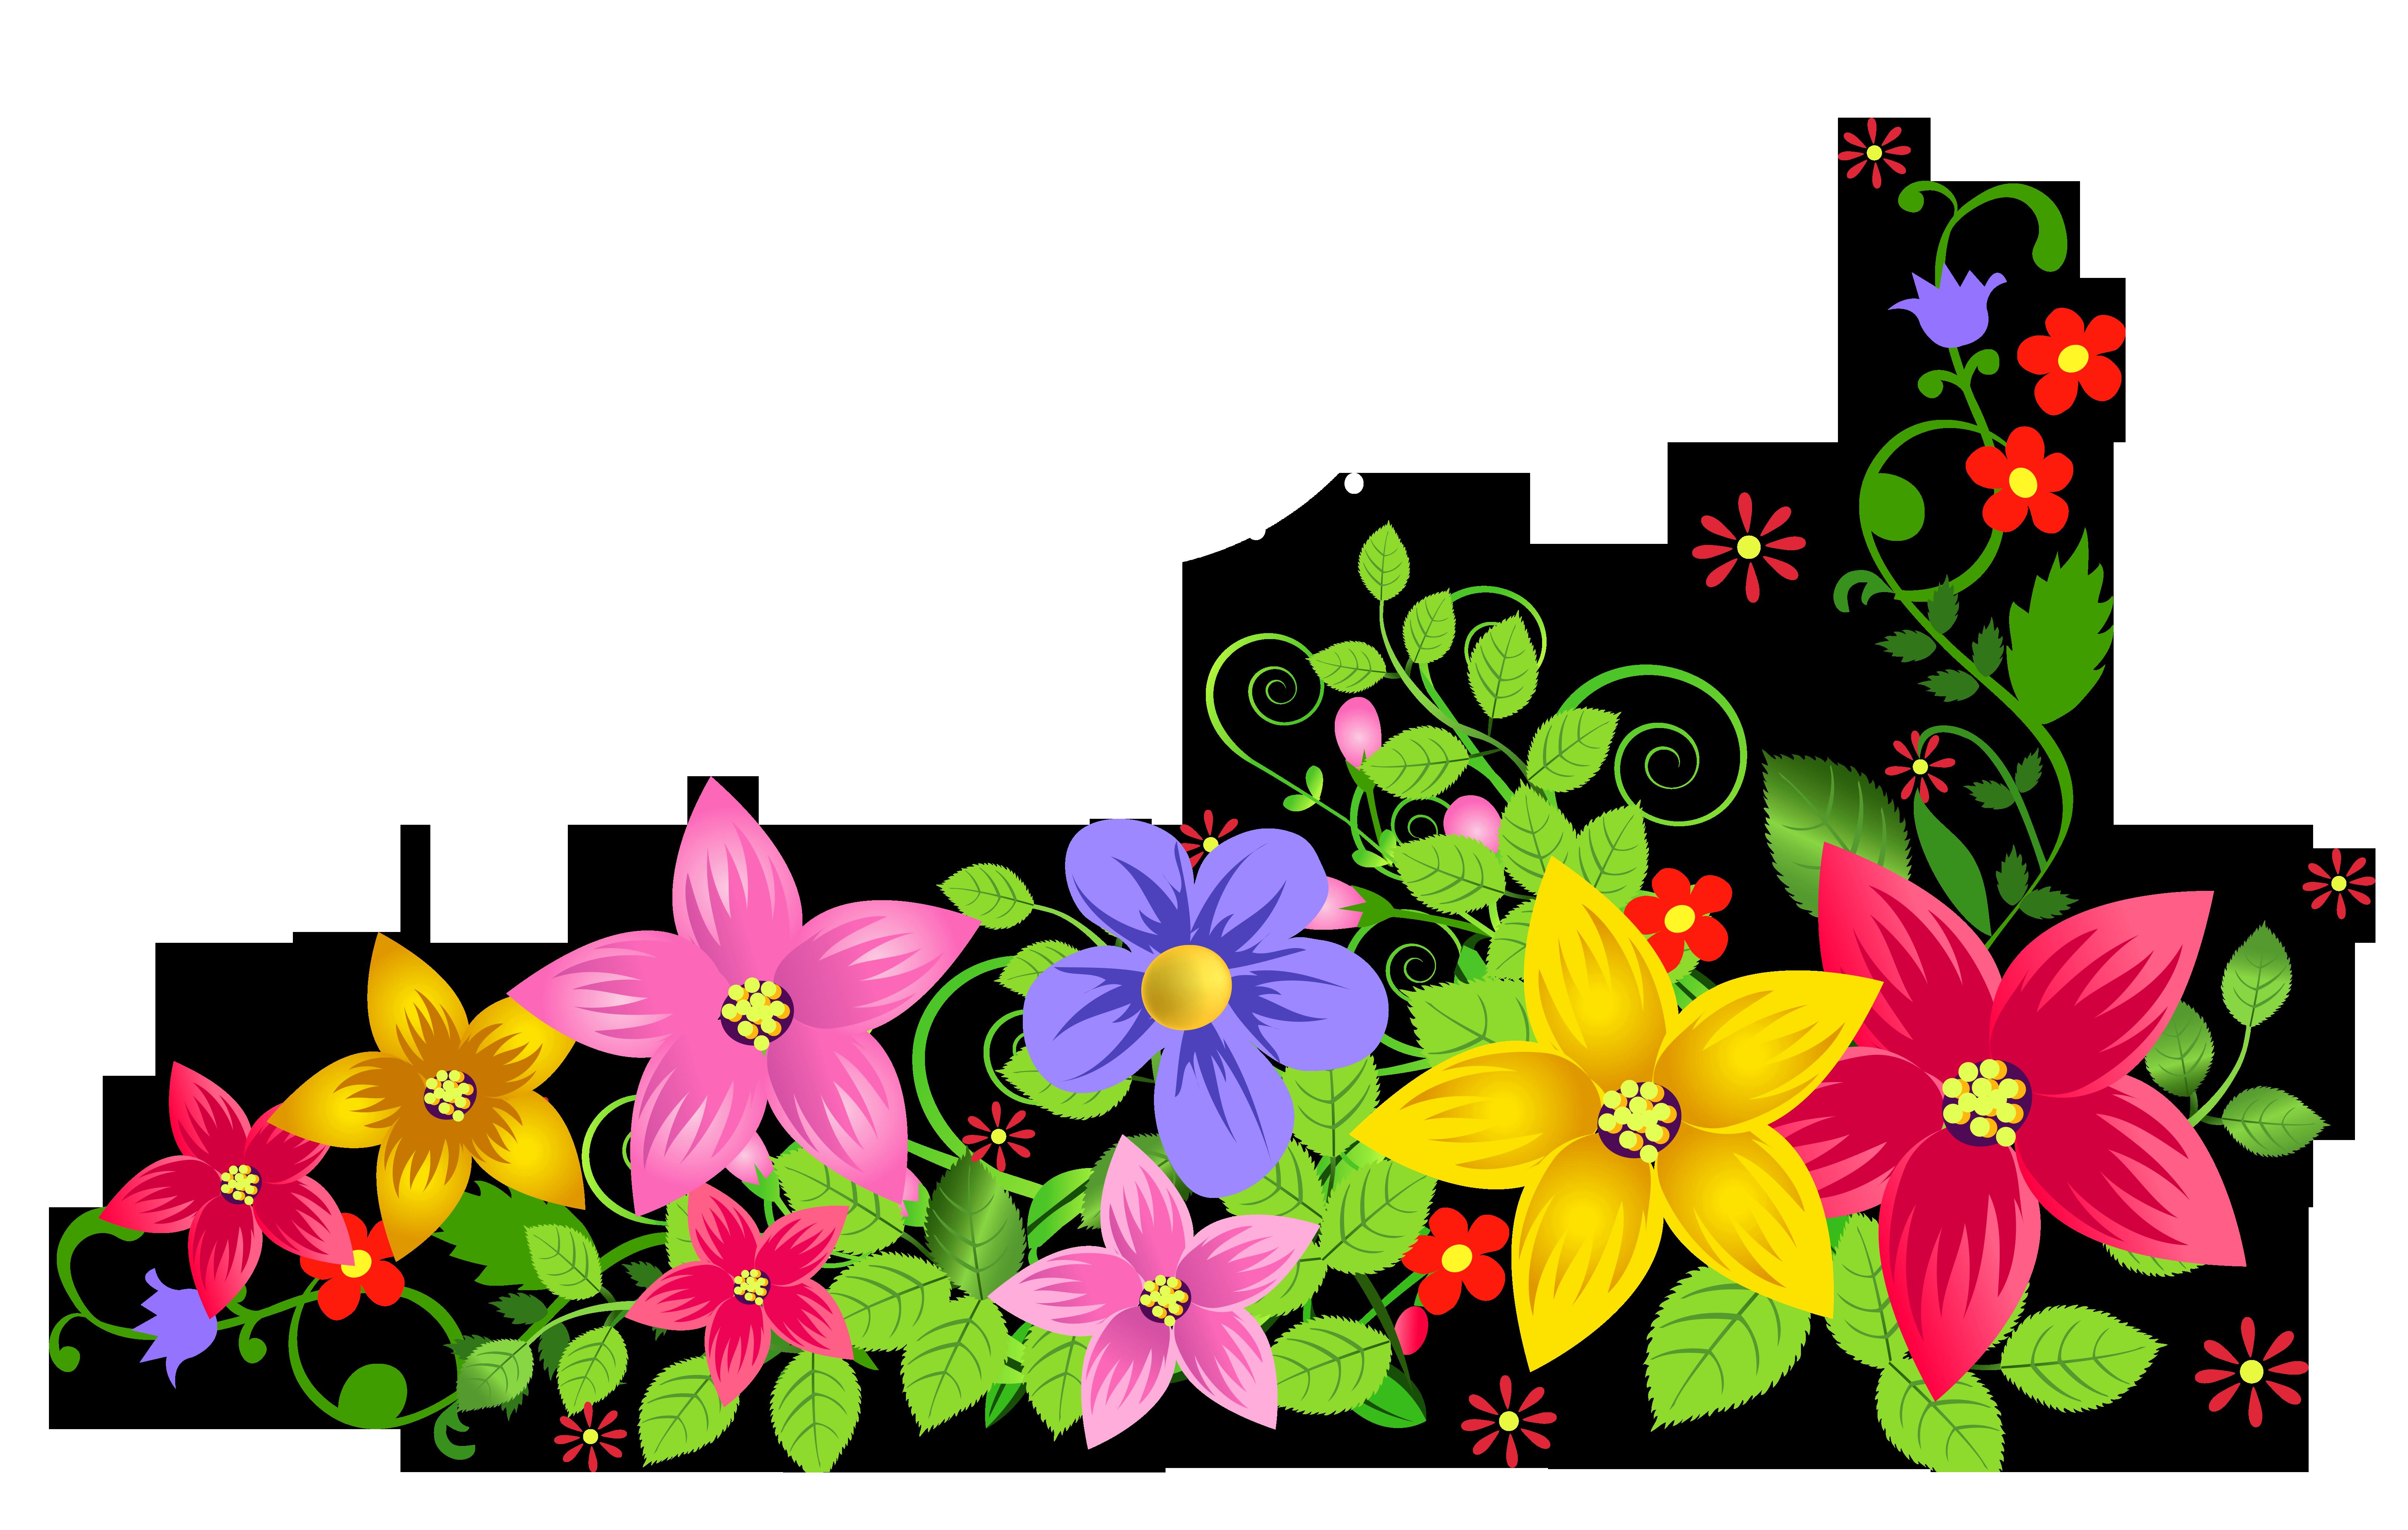 Floral PNG Transparent Image - Floral PNG HD - Flower HD PNG